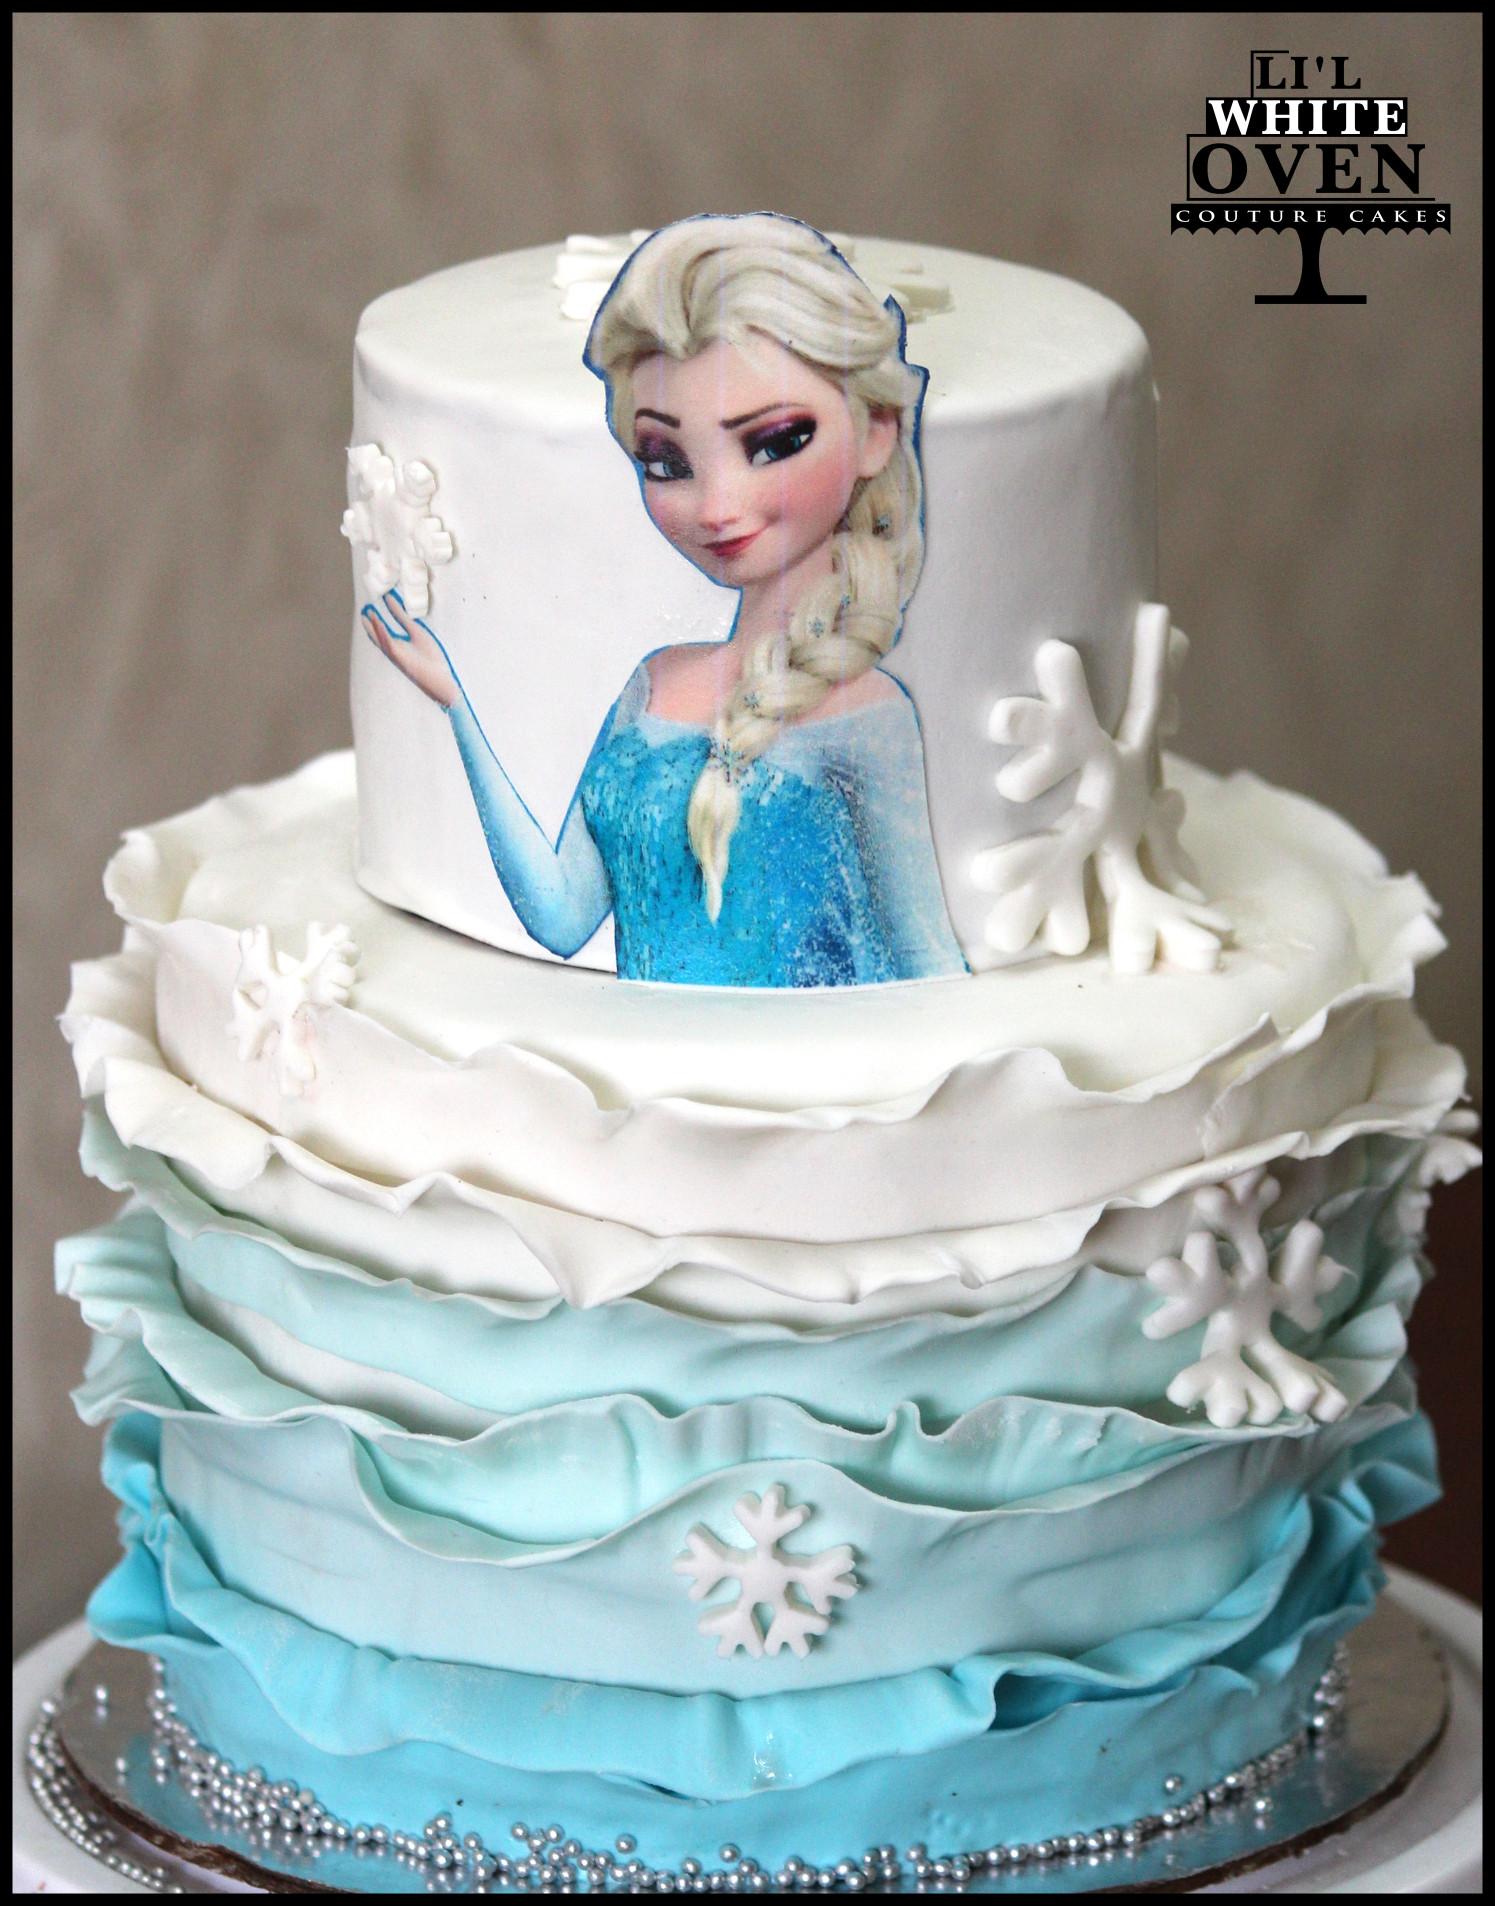 Frozen Birthday Cake  Birthday Cakes in Mumbai – Li l White Oven